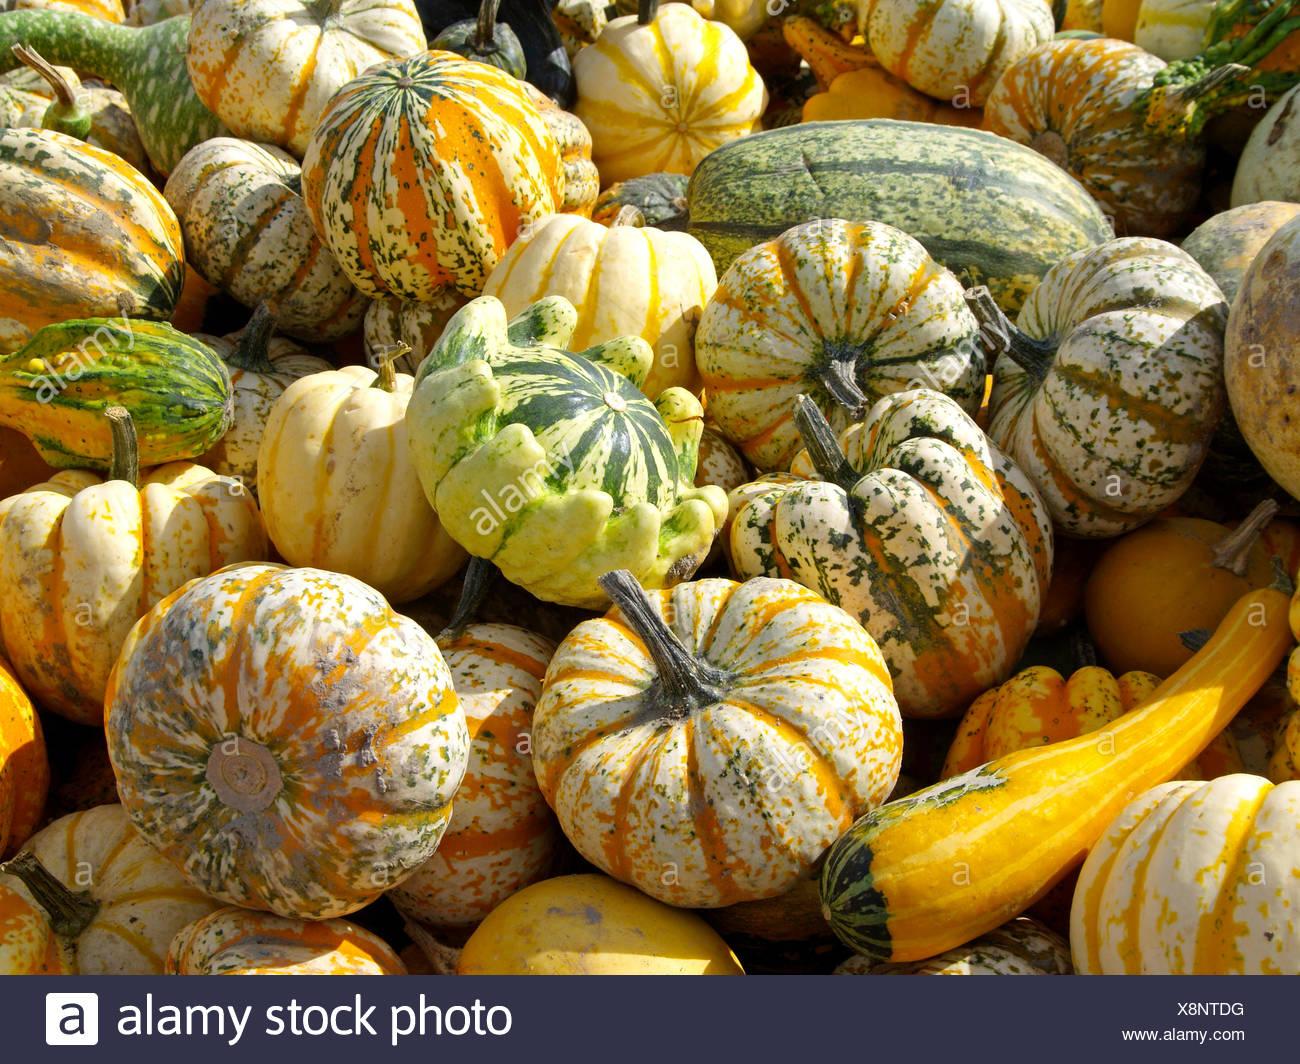 Frucht, Fruechte, Herbst, Kuerbis, Kuerbisse, Zierkuerbis, Zierkuerbisse, bunt, bunte, farbenfroh, farbig, malerisch - Stock Image